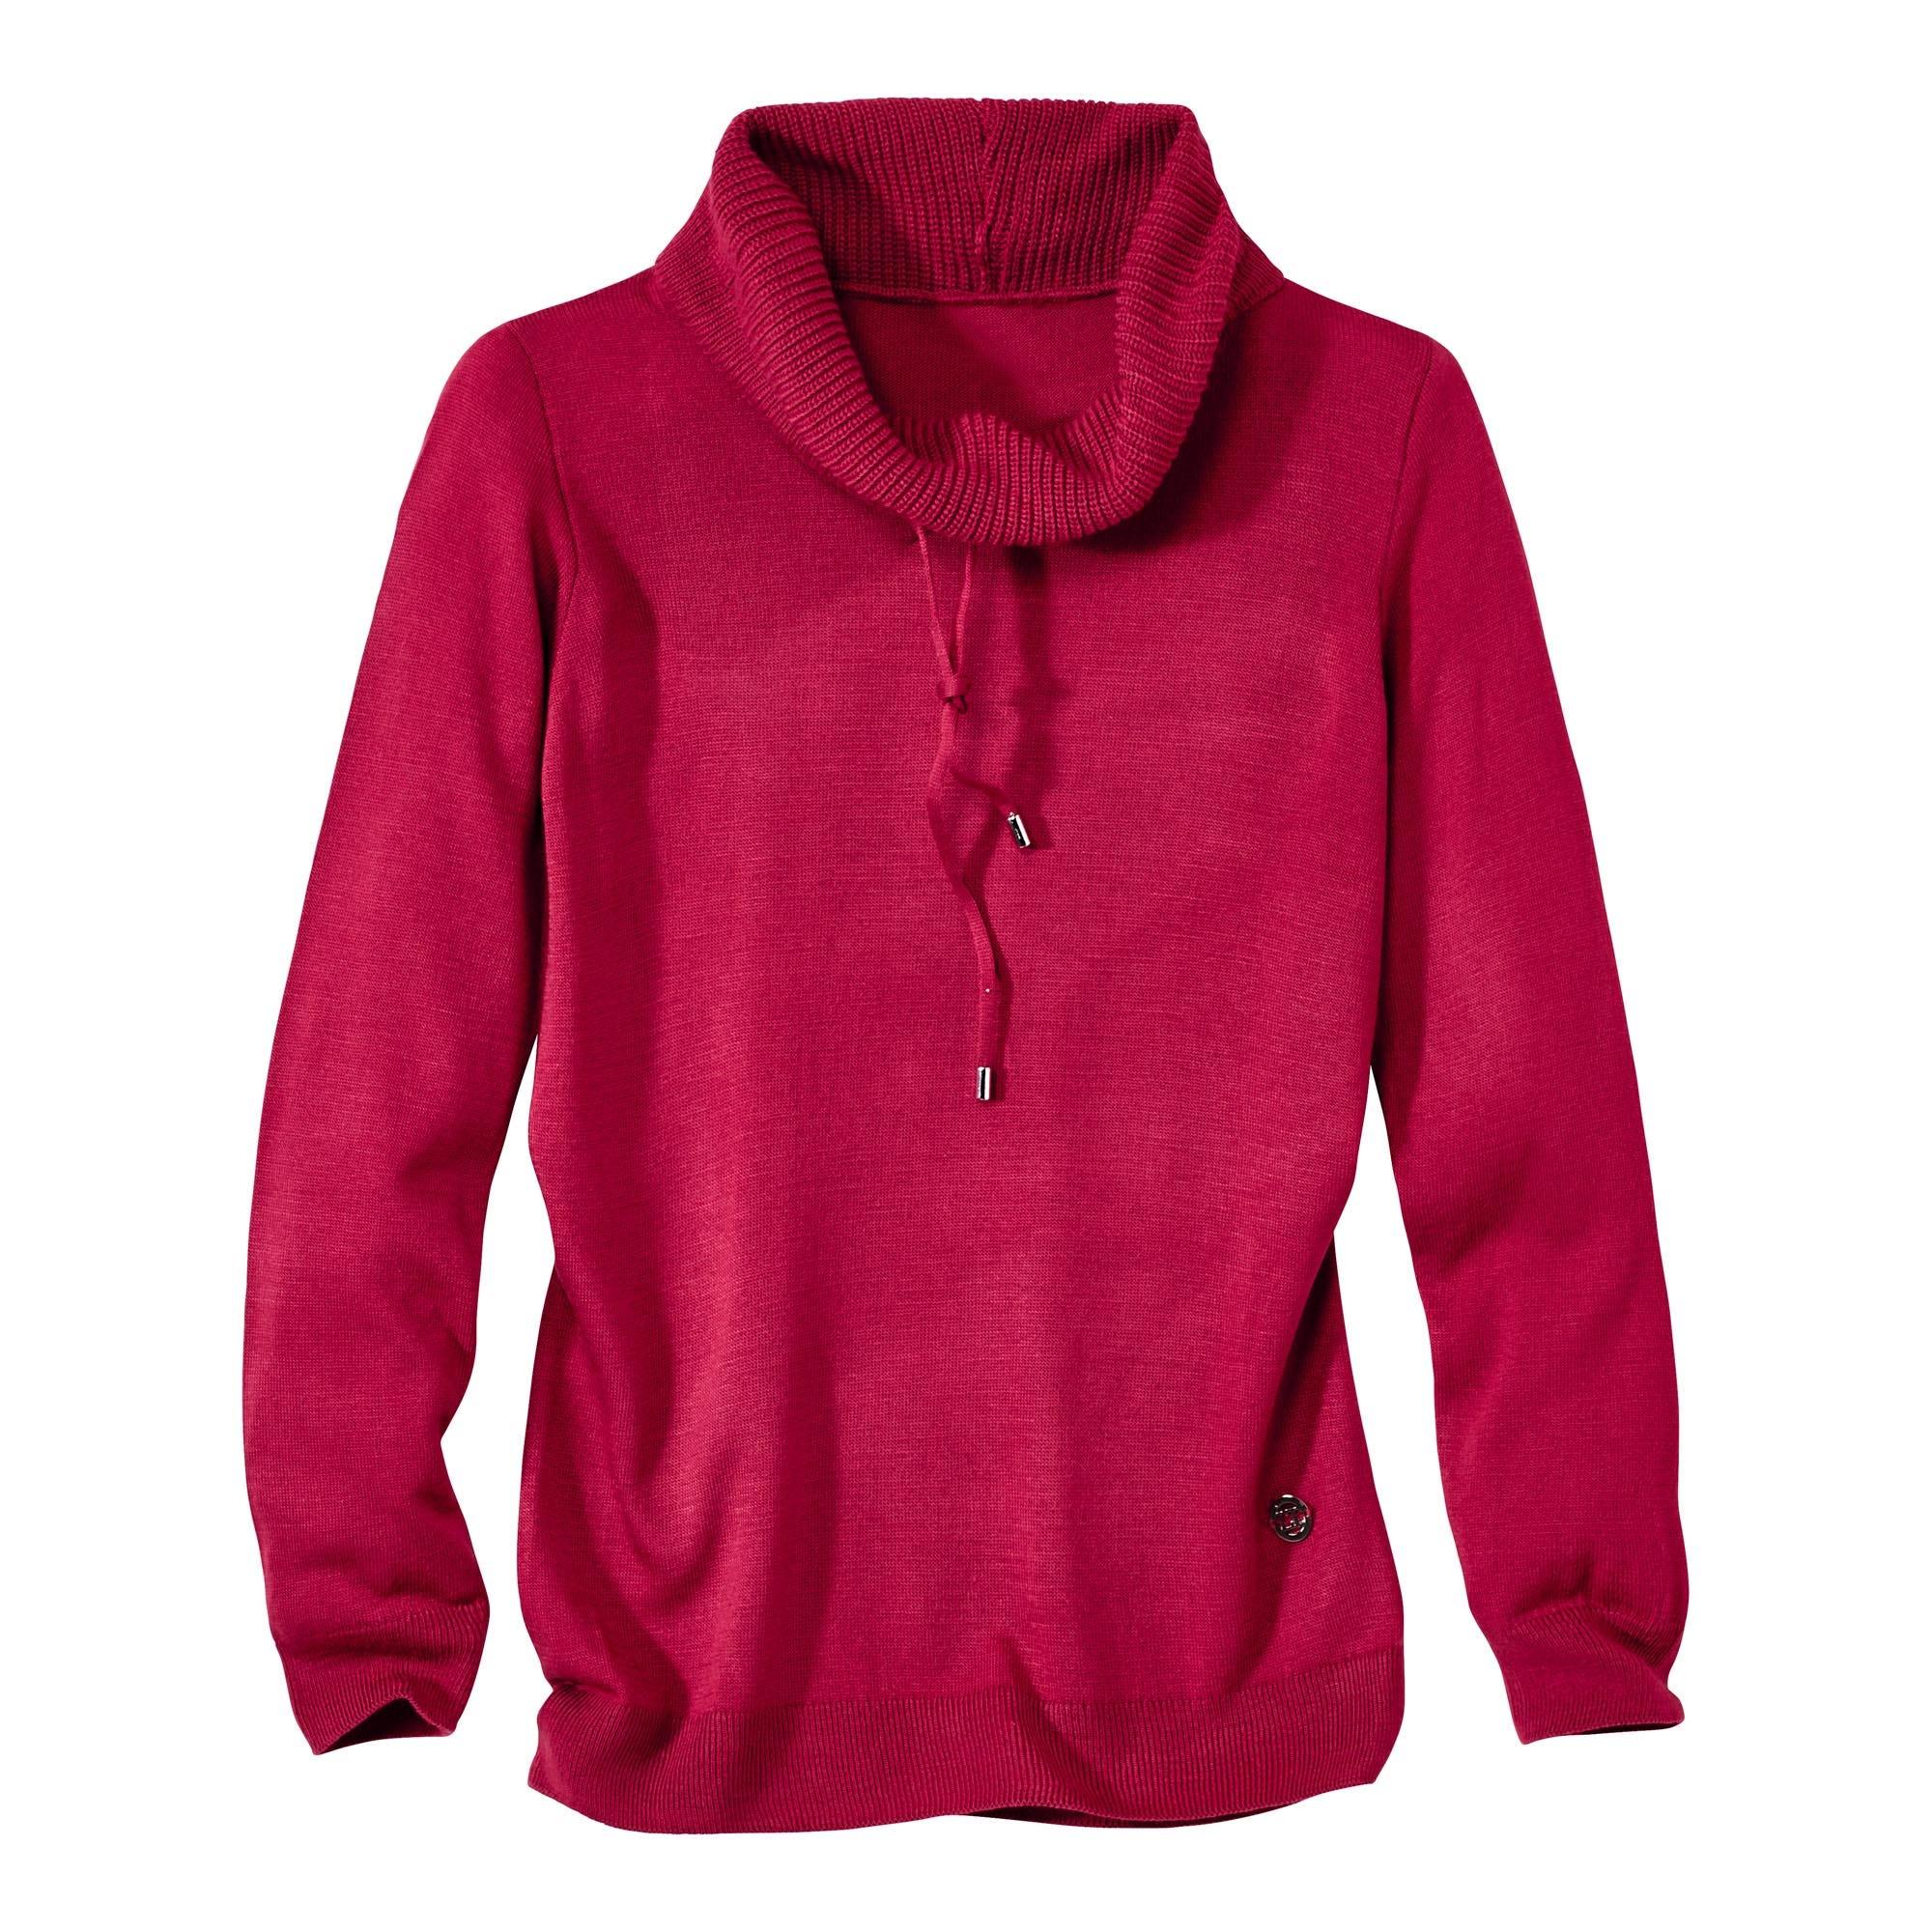 pullover strickjacken : dünne baumwollsocken damen,blaue